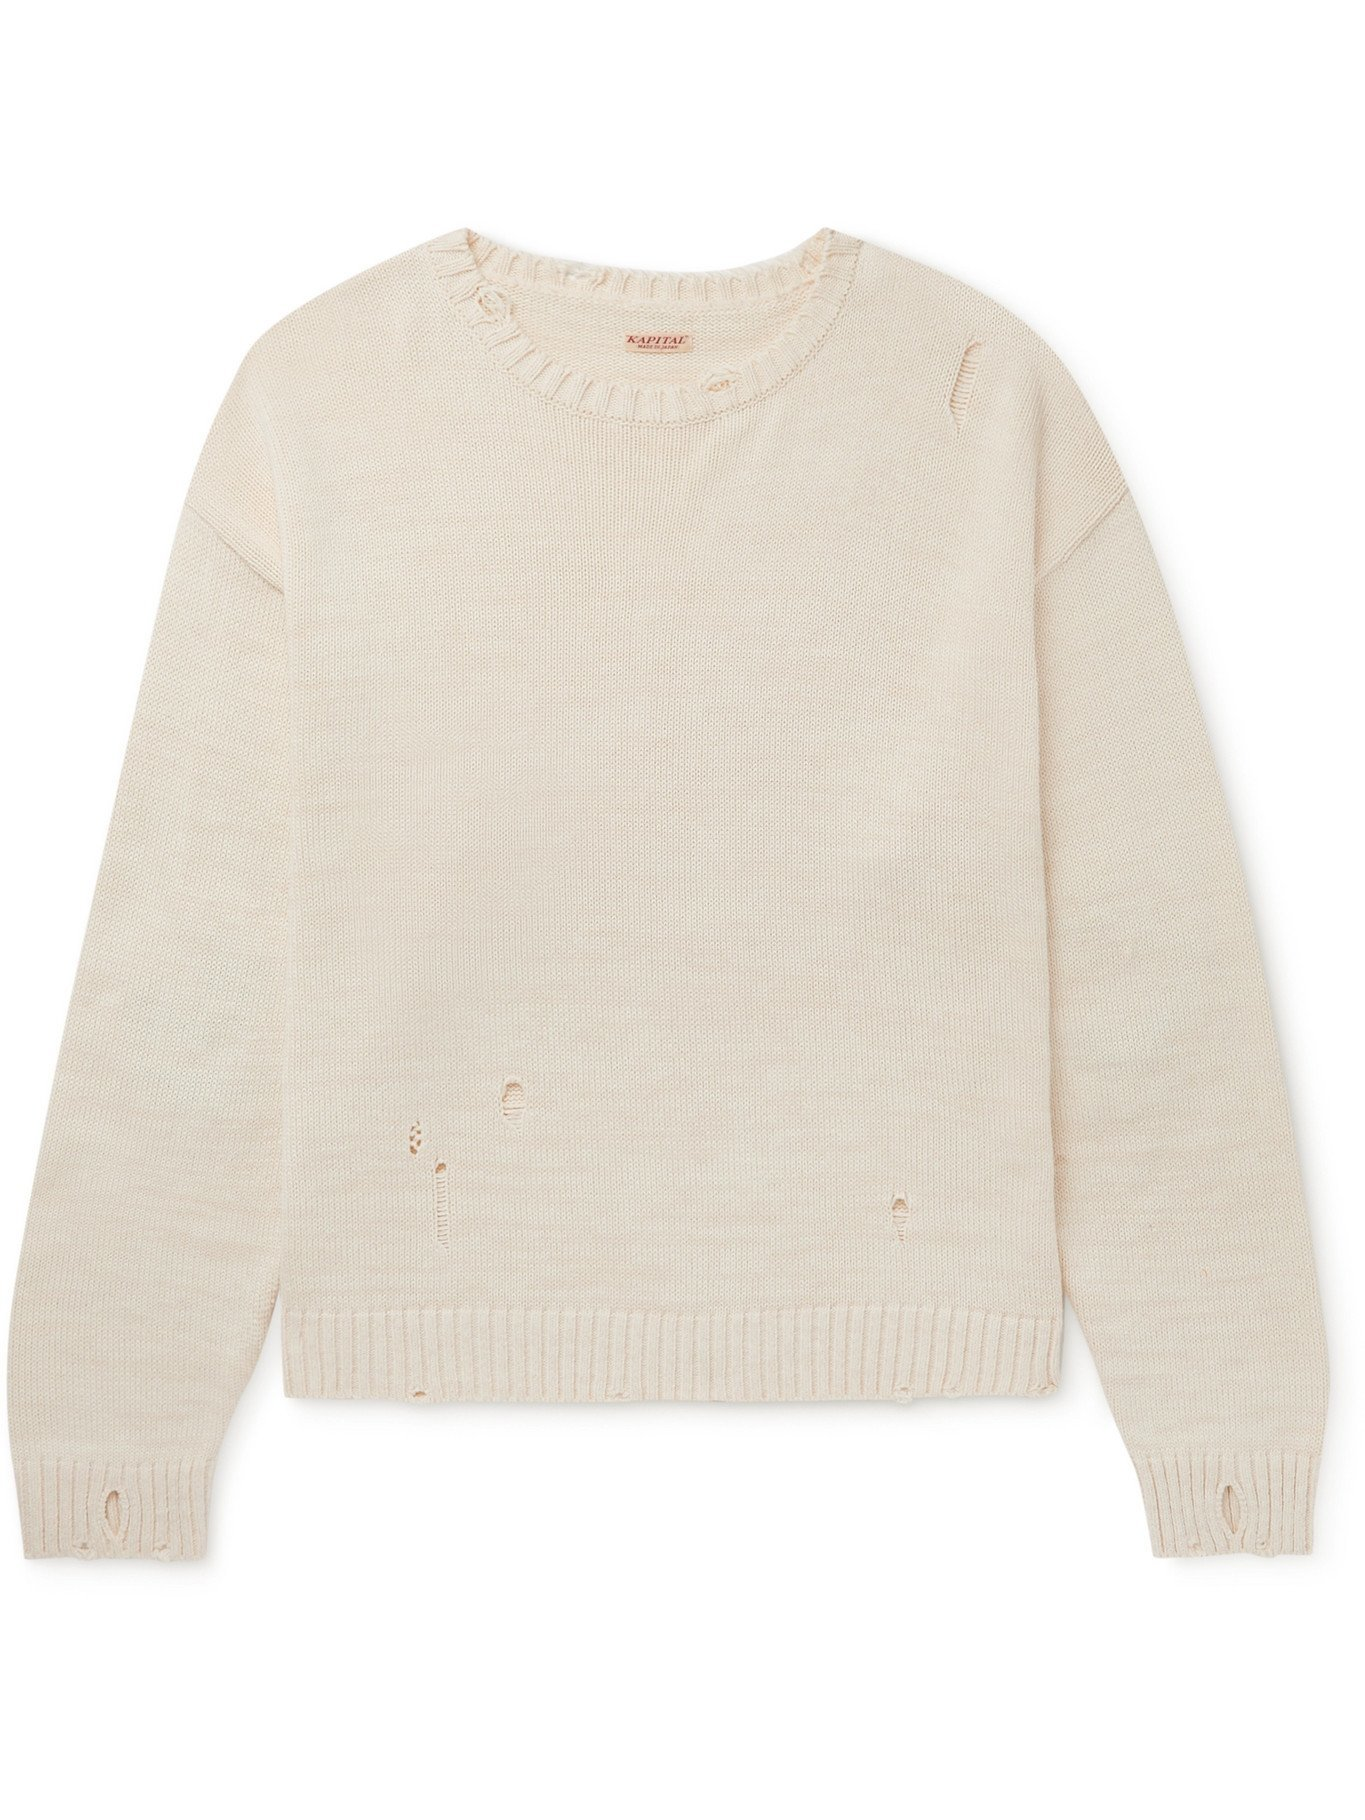 Photo: KAPITAL - Distressed Intarsia Cotton-Blend Sweater - Neutrals